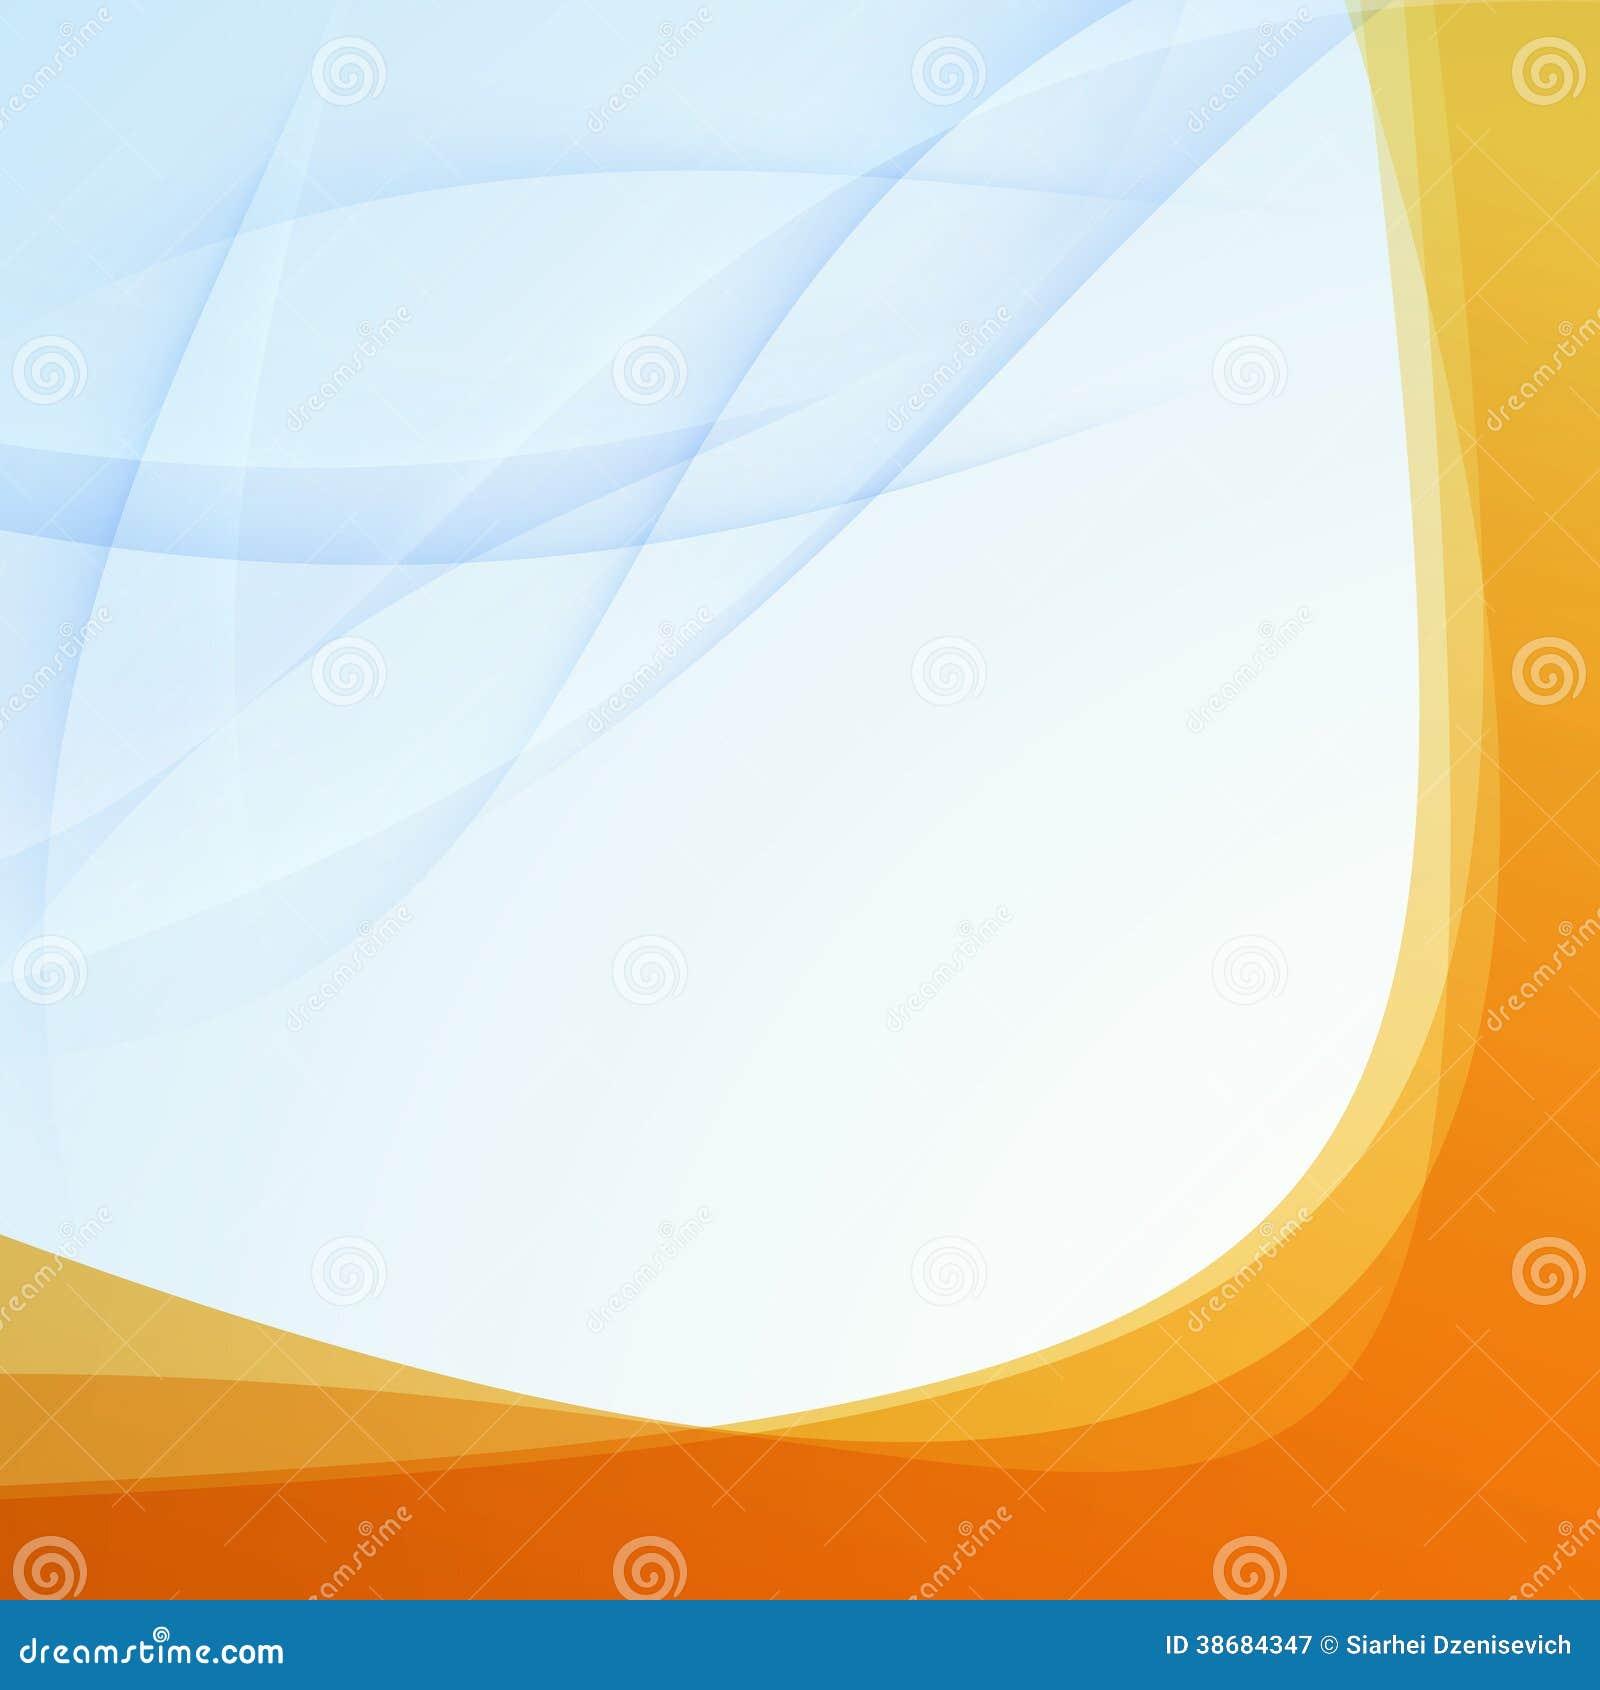 transparent orange border folder template